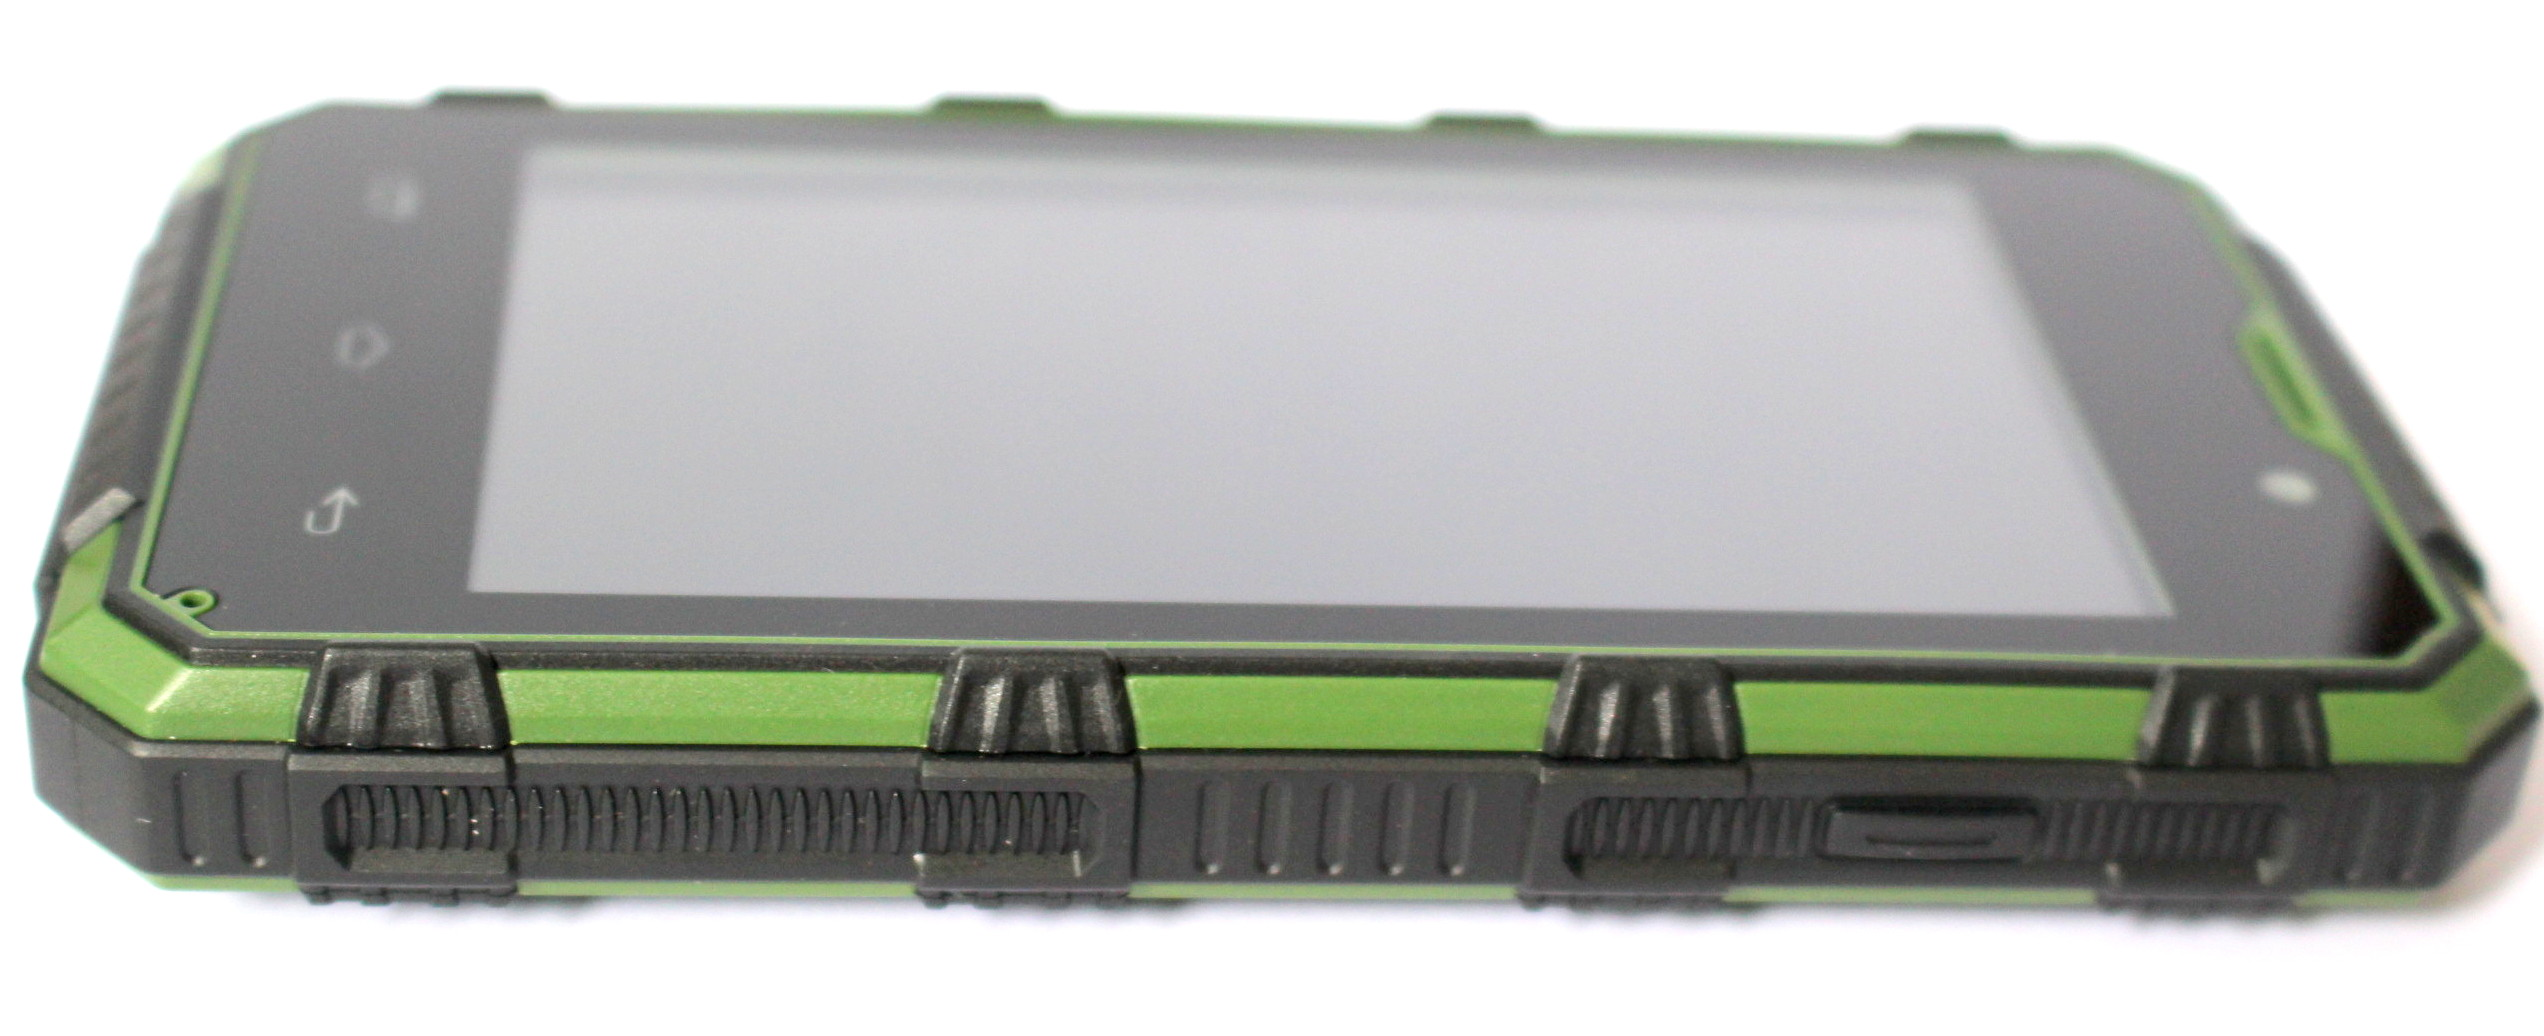 Smartphone chống nước Dio 9